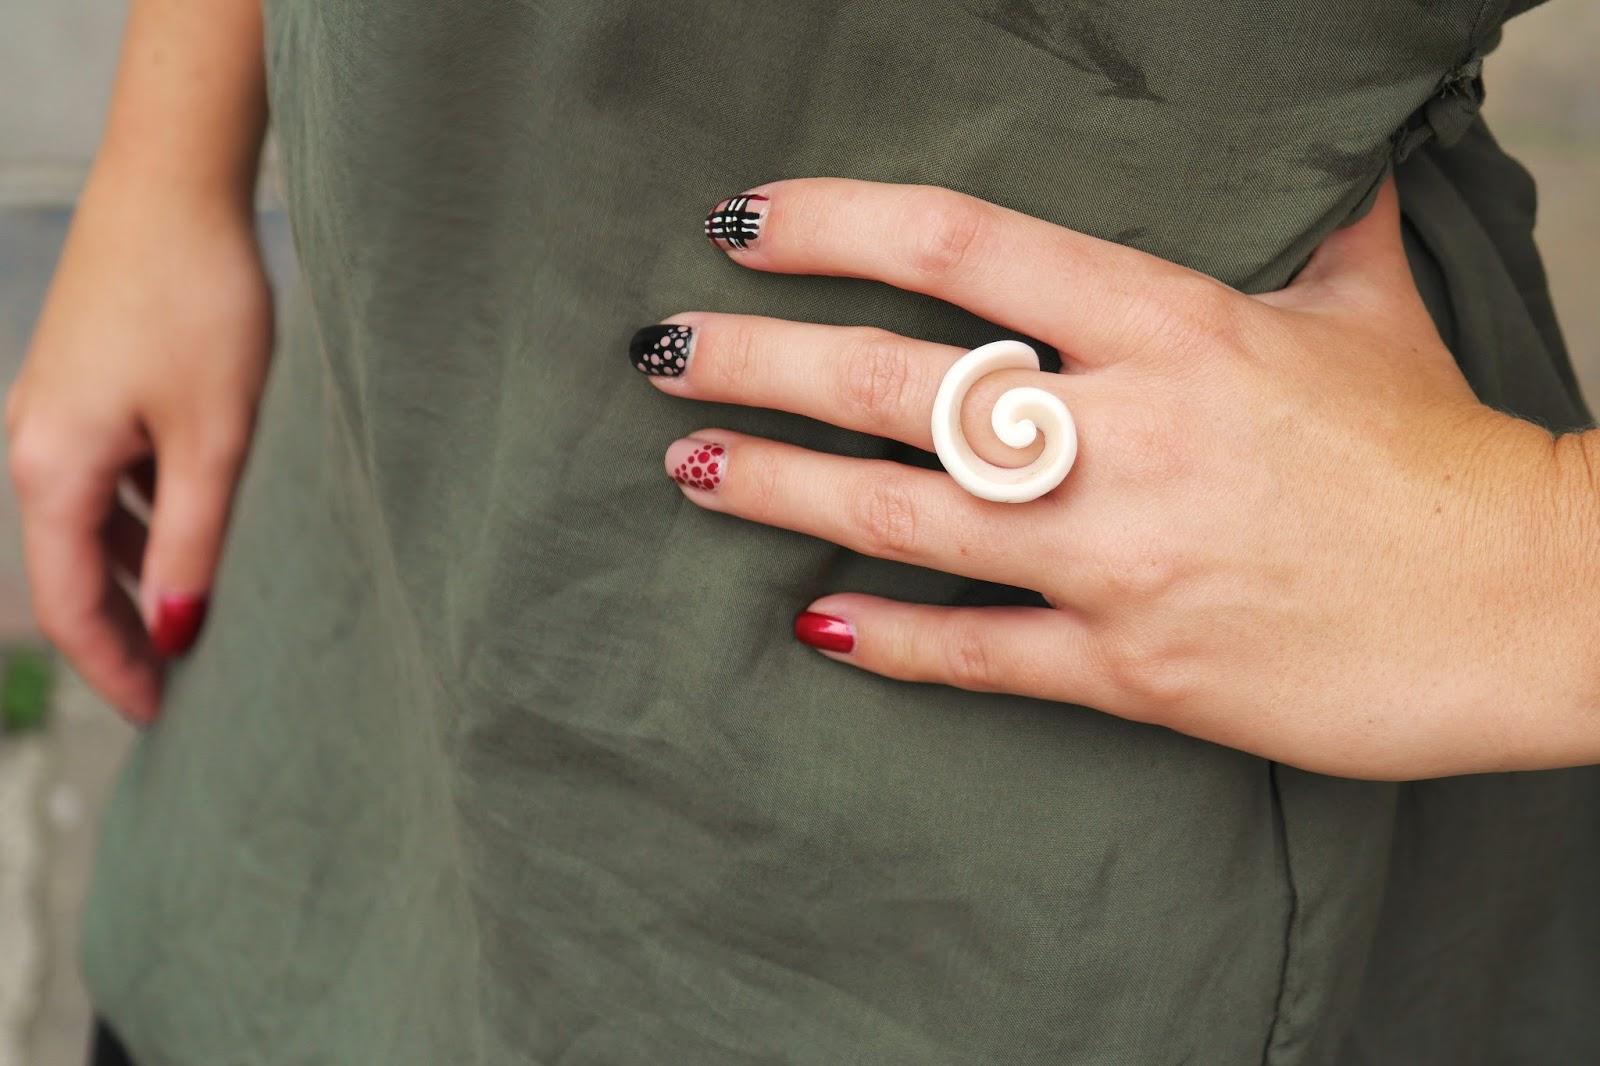 Burberry nail art